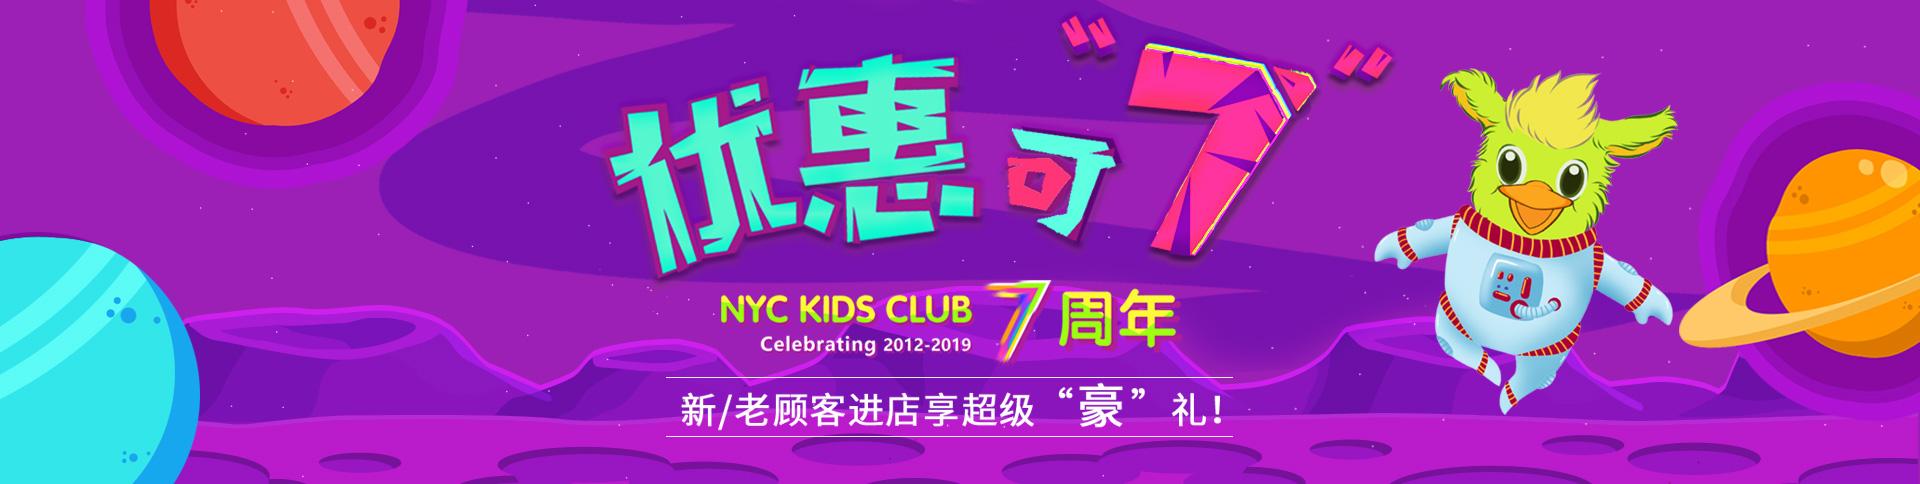 NYC纽约国际早教中心七周年